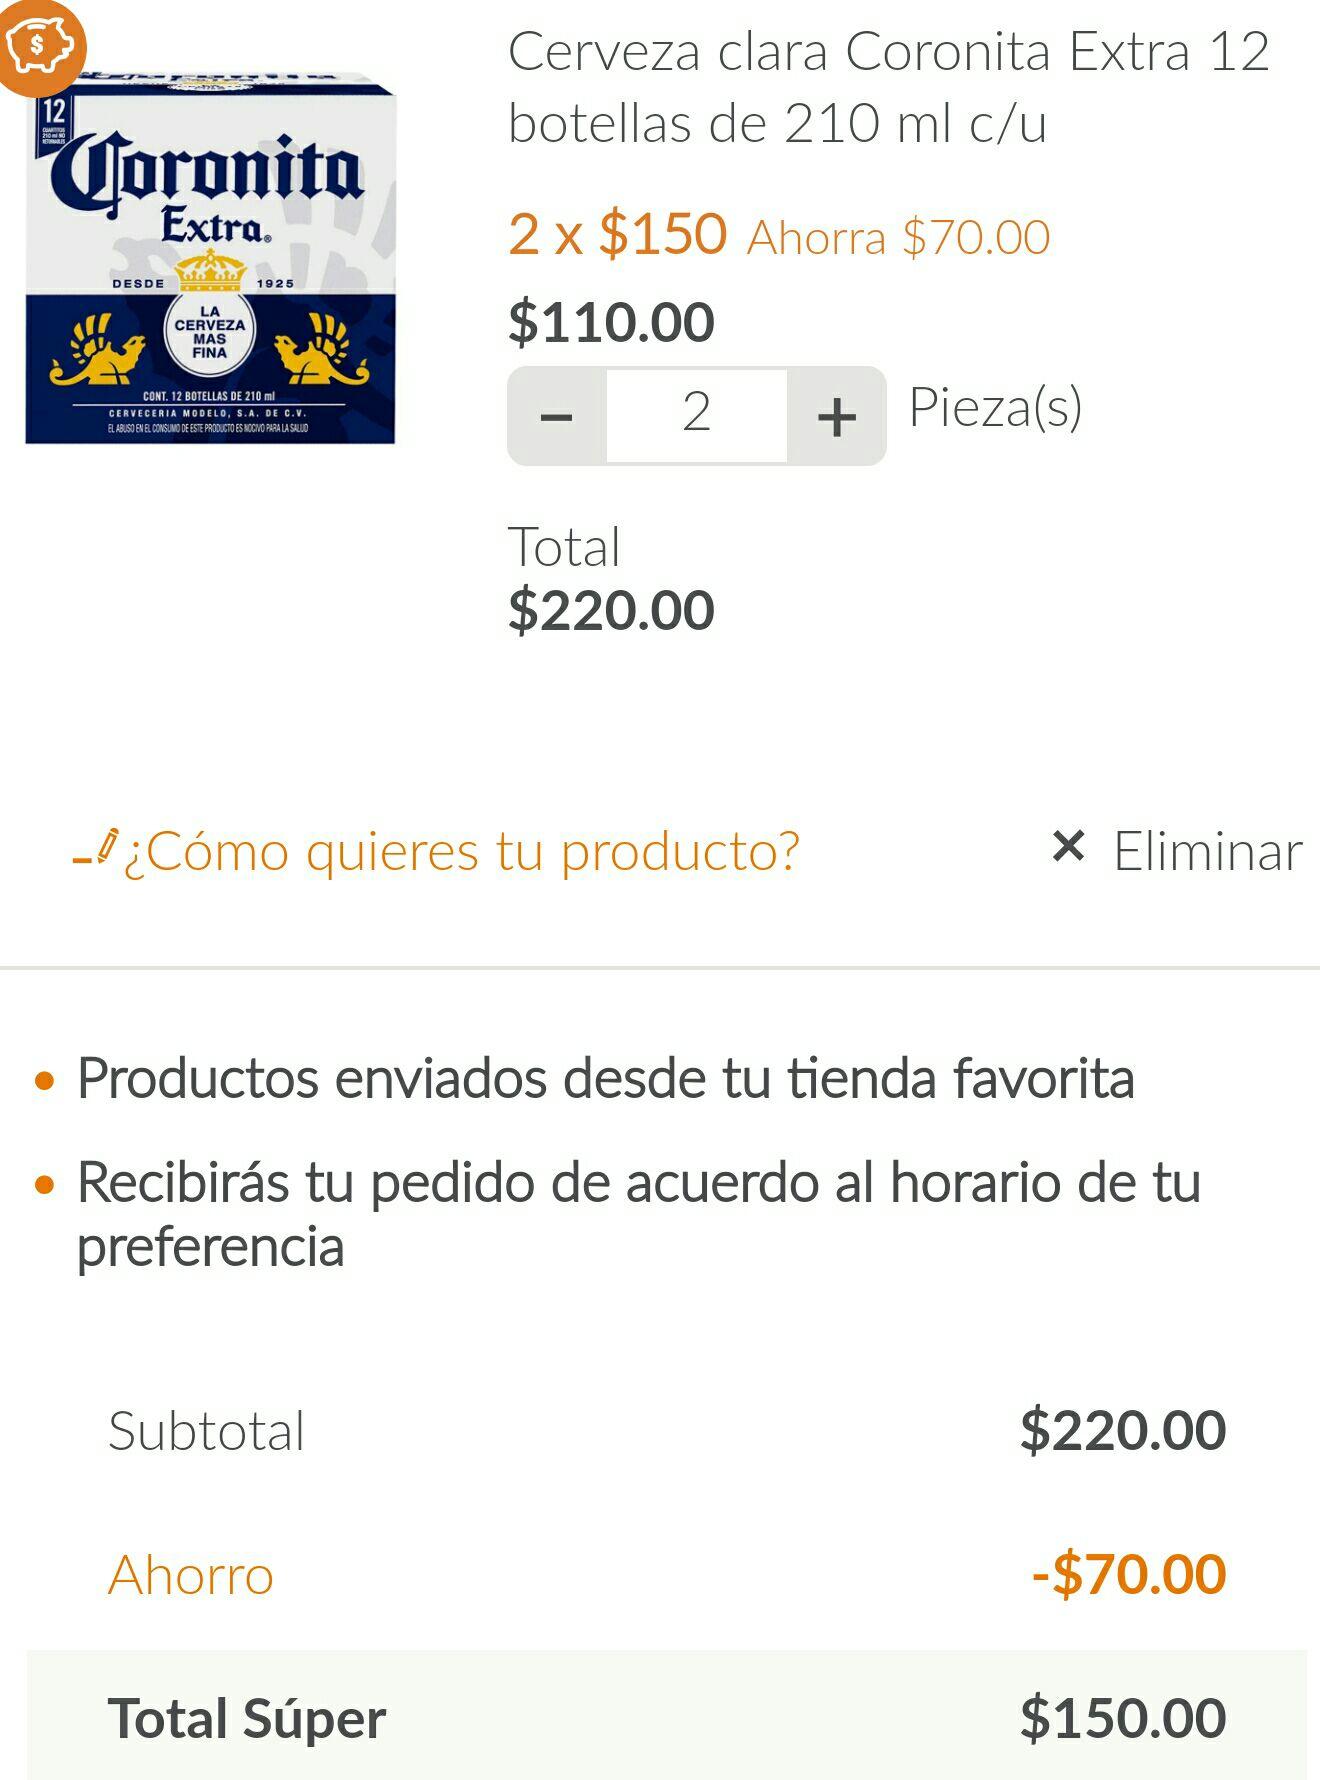 Superama.com.mx: 2(12)x150 Coronita Extra 12 botellas de 210 ml c/u